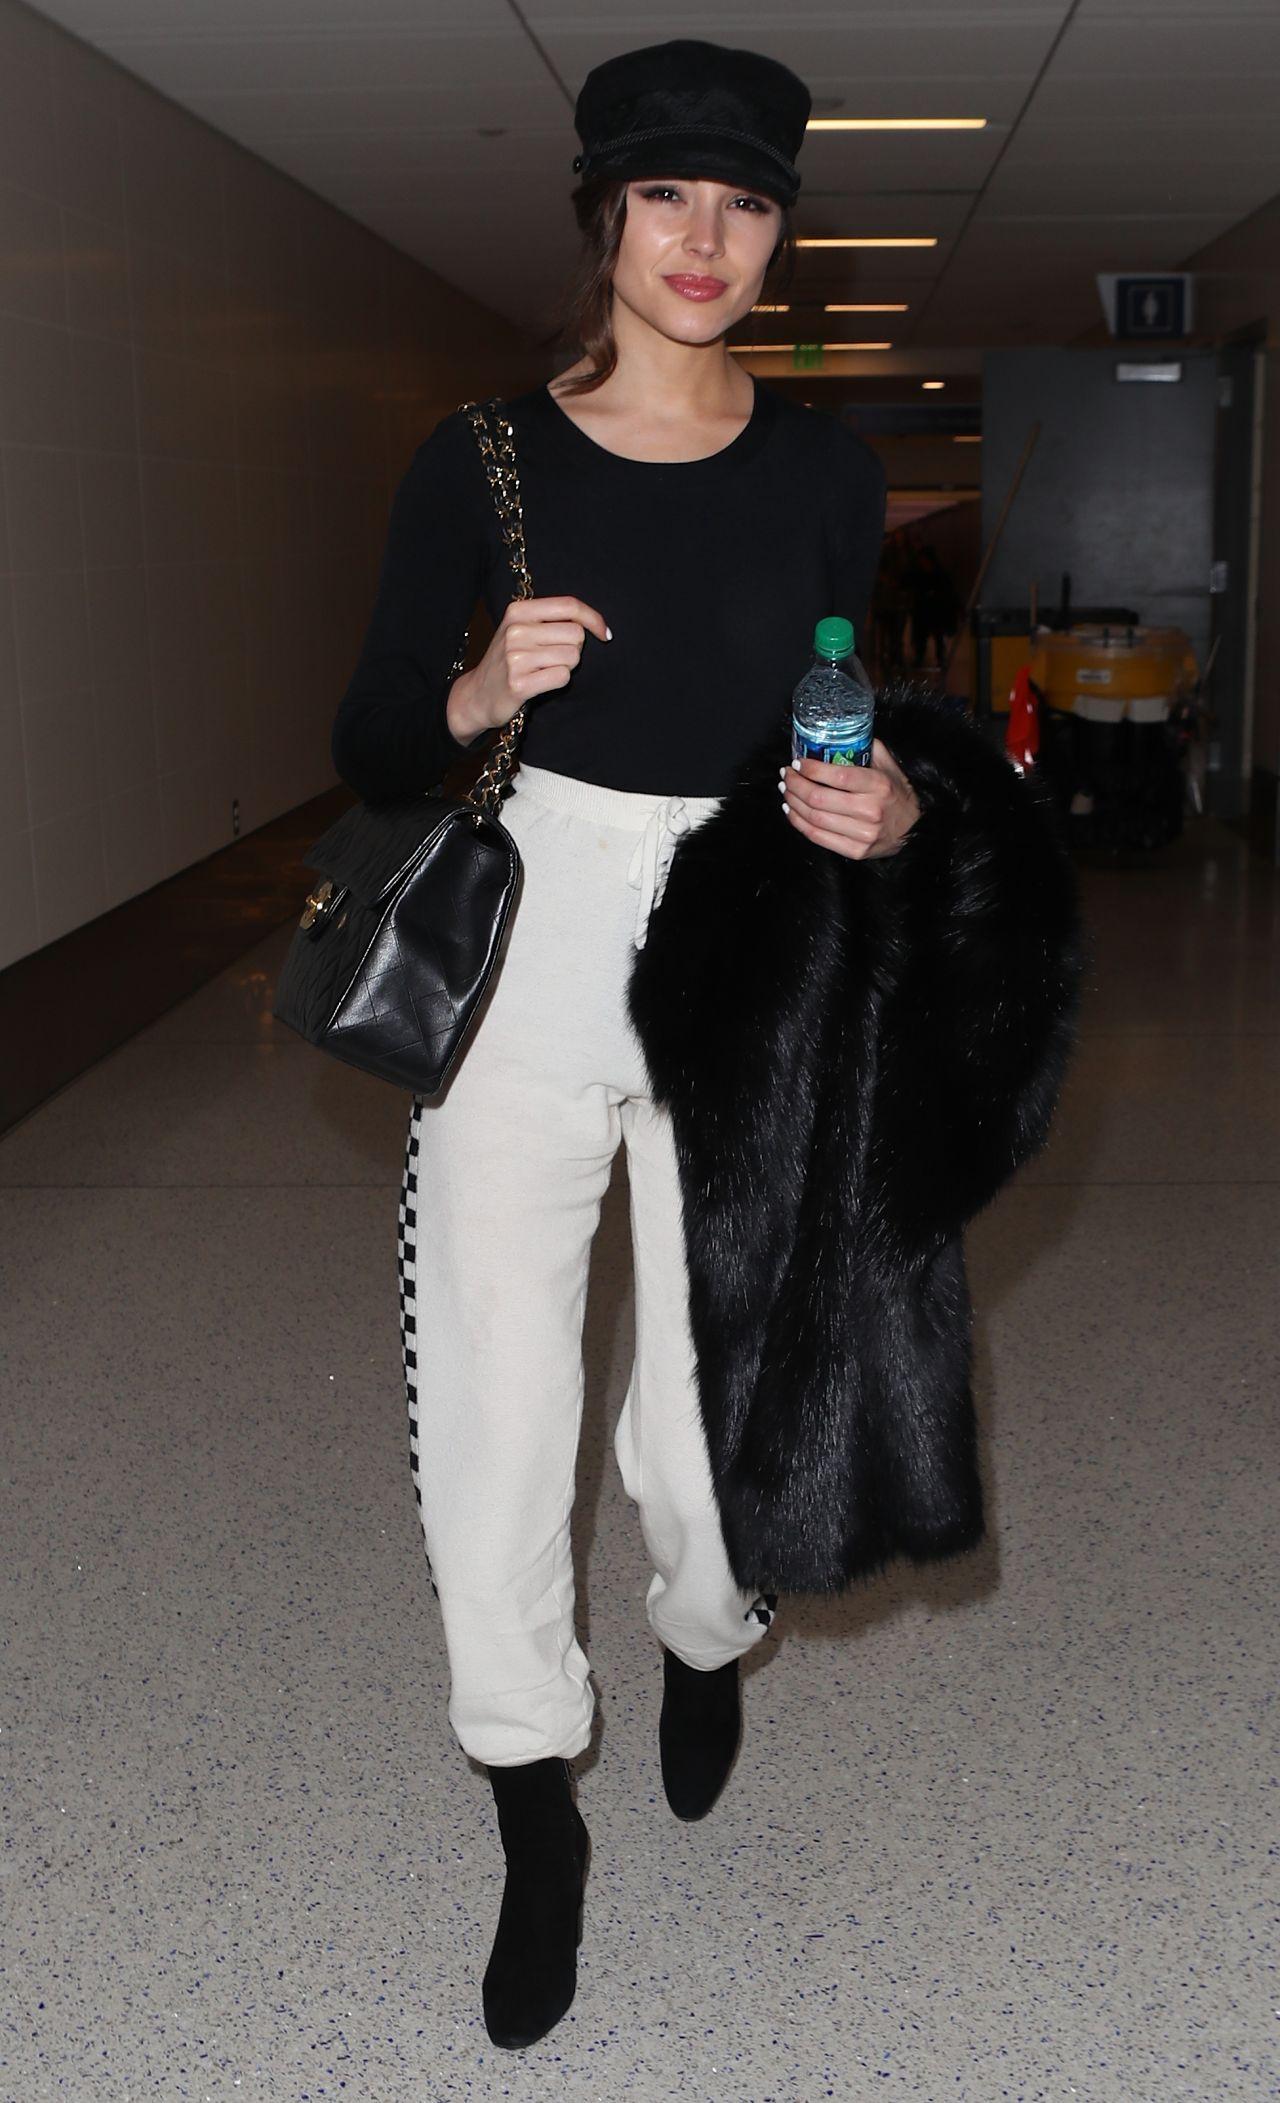 Olivia Culpo Street Fashion Lax In La 01 08 2018